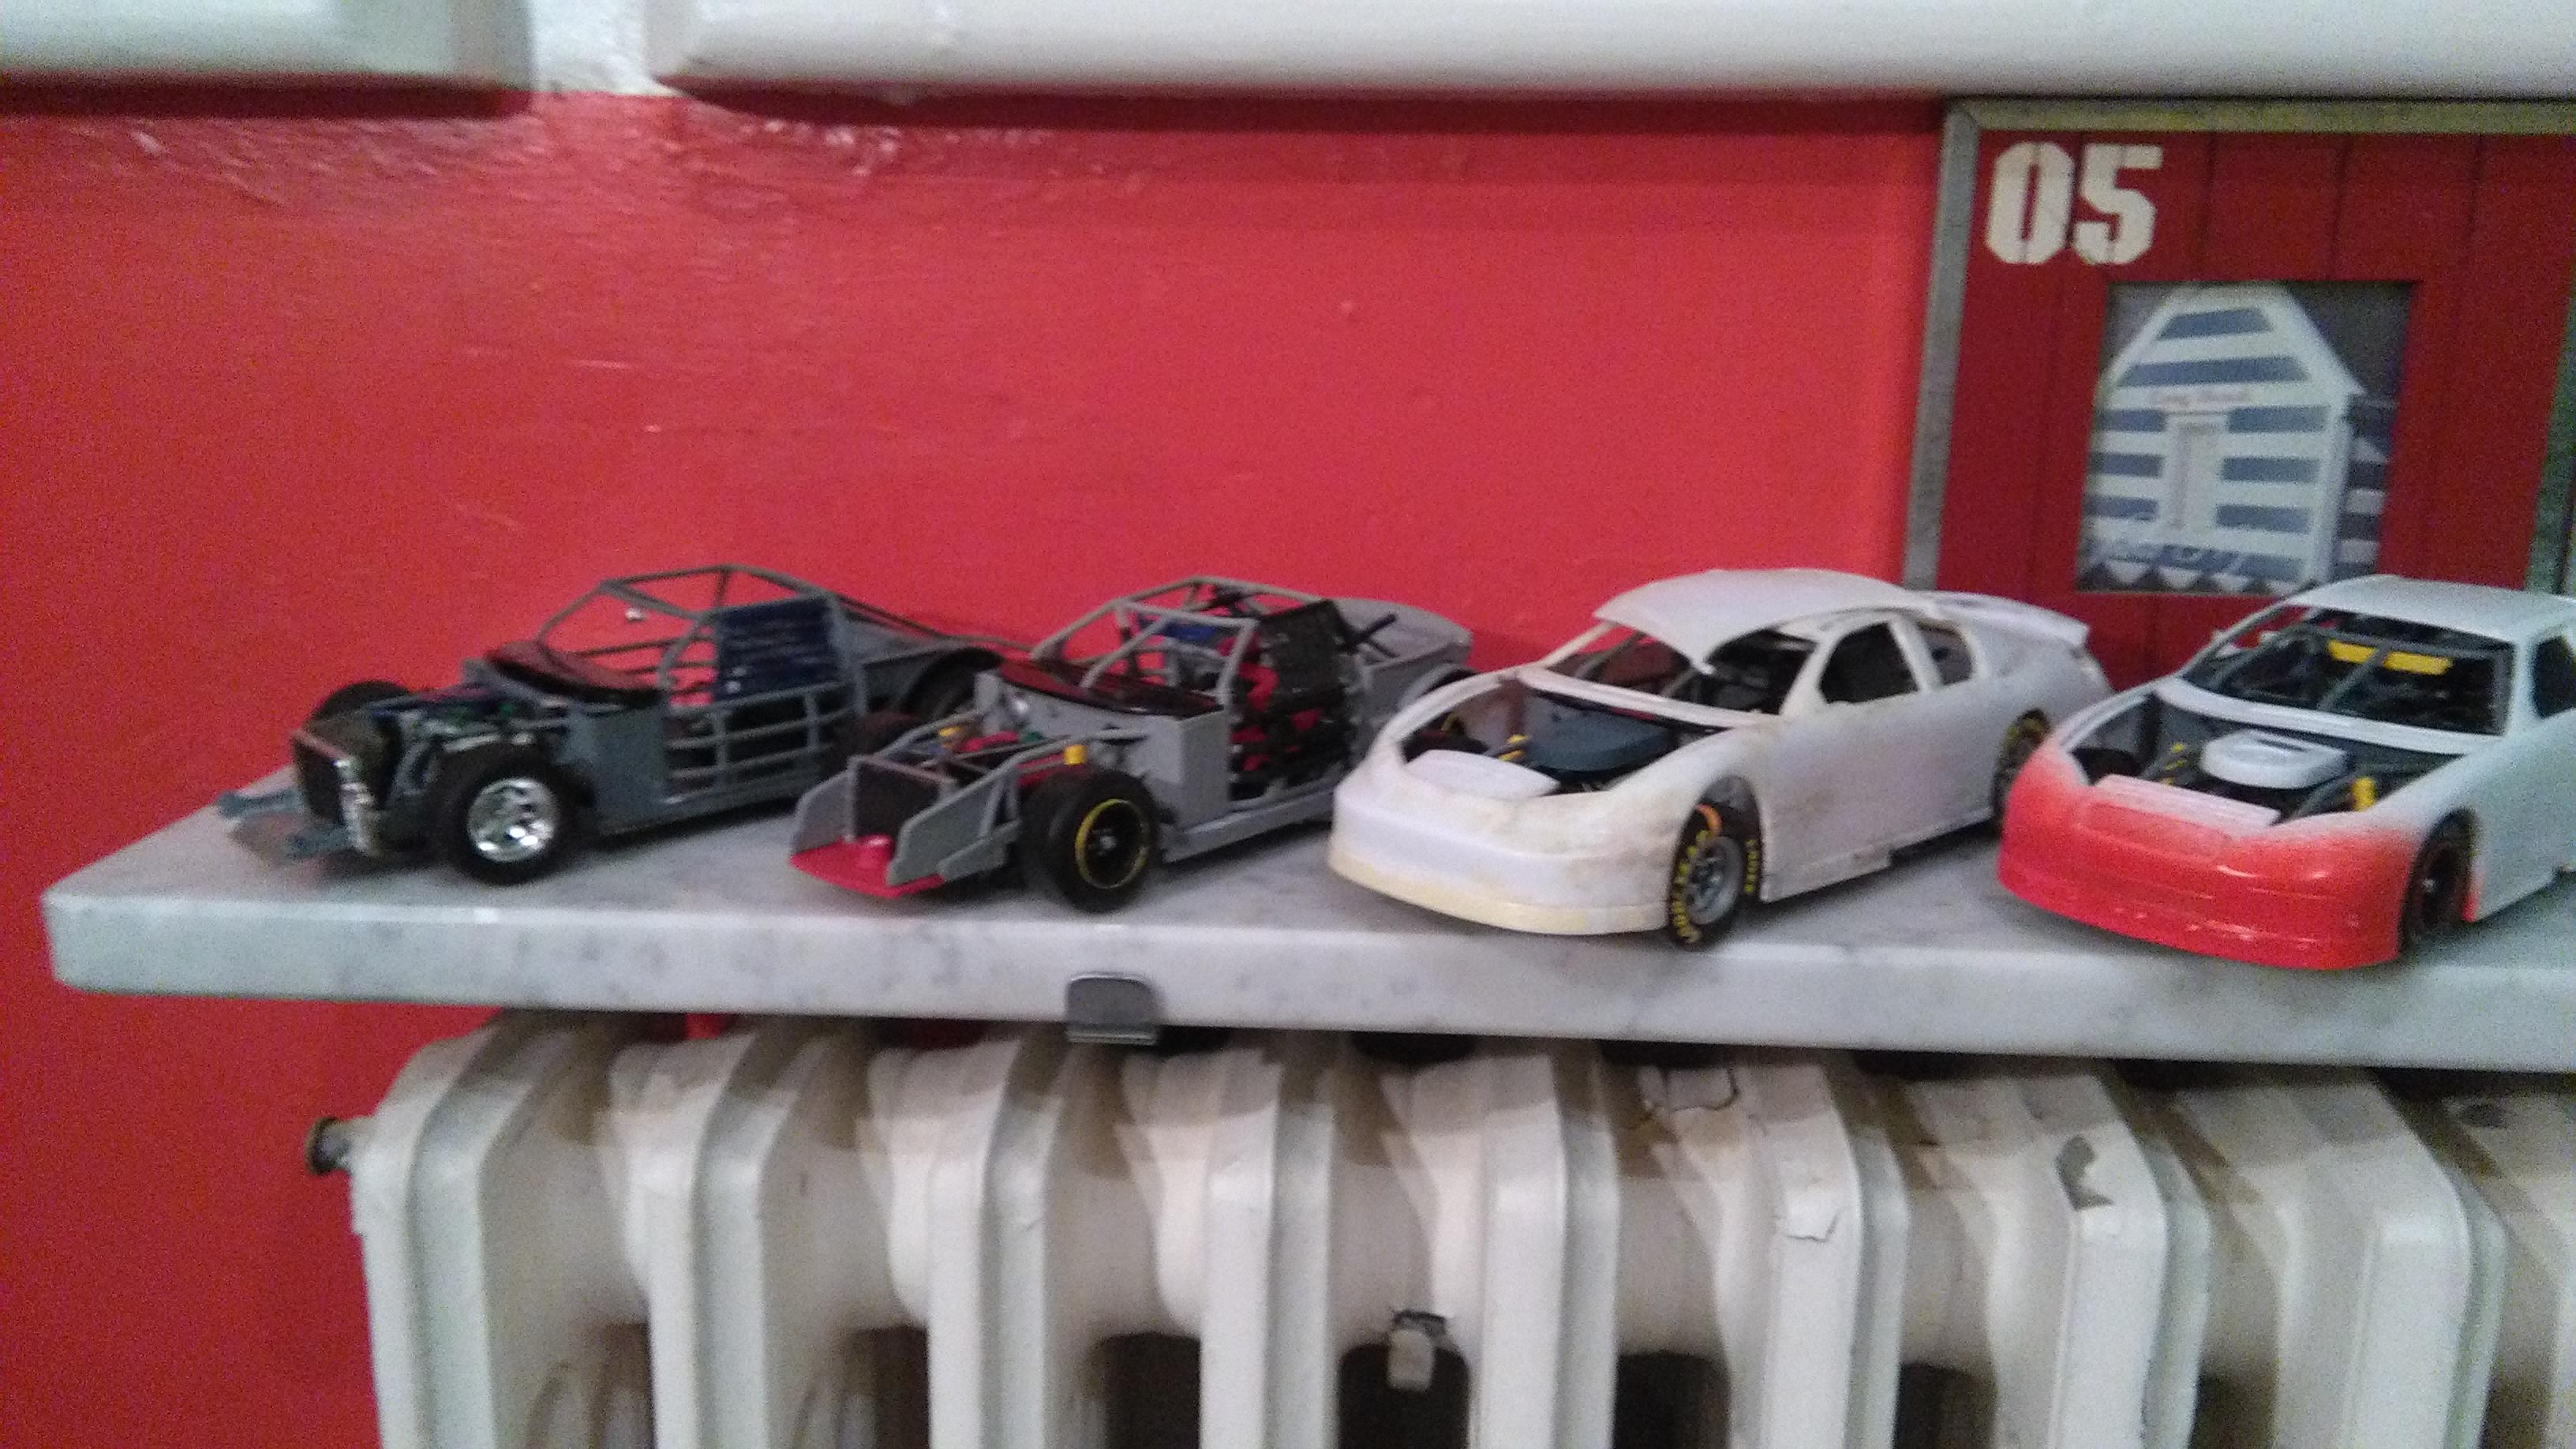 Chevy Monte-Carlo 2005 #24 Jeff Gordon Pepsi/Star Wars  195421IMG20170422234147